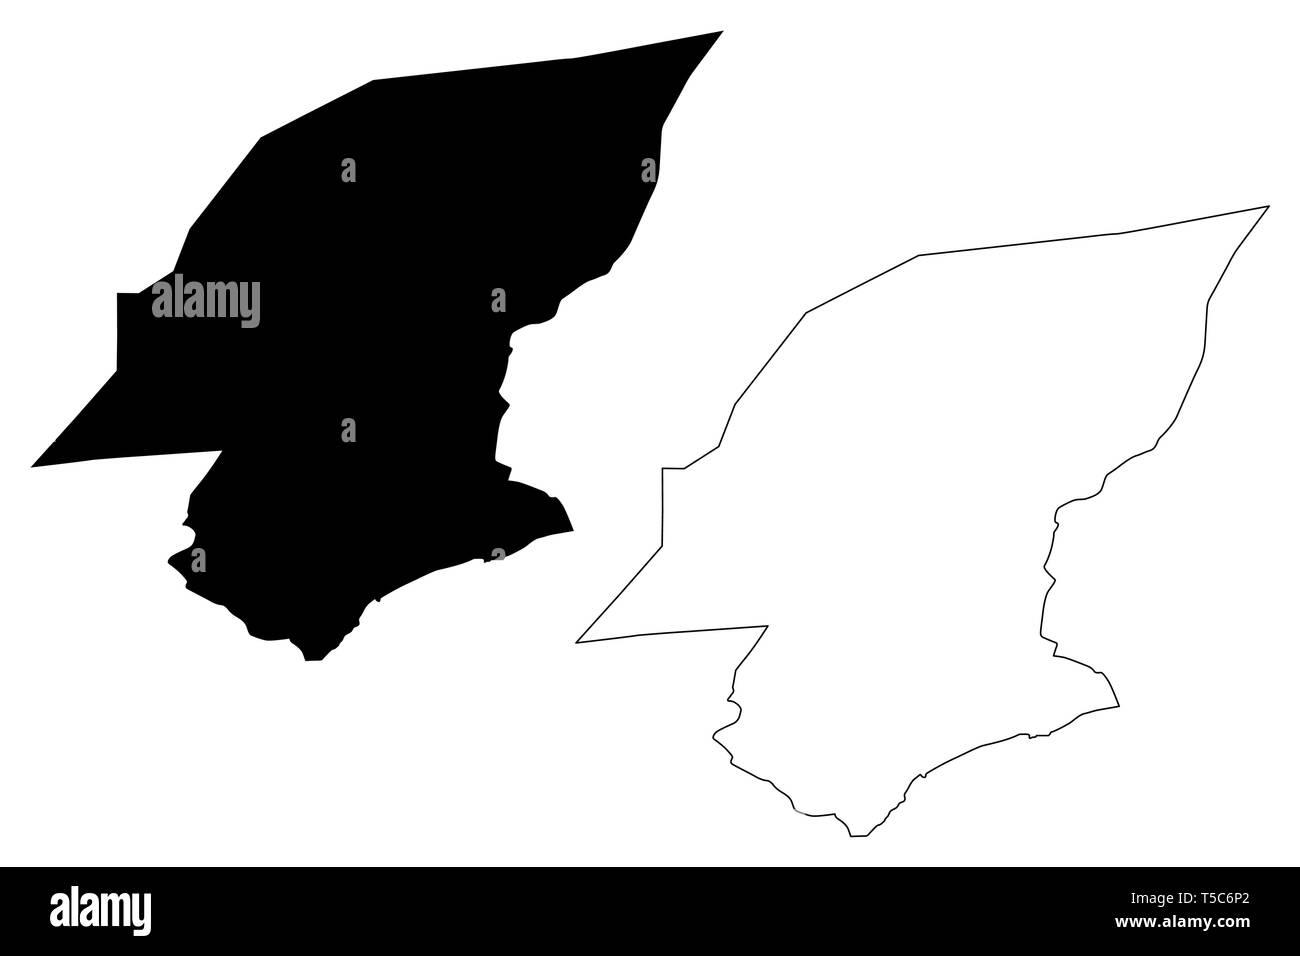 Hadhramaut Governorate (Governorates of Yemen, Republic of Yemen) map vector illustration, scribble sketch Hadramawt map - Stock Vector